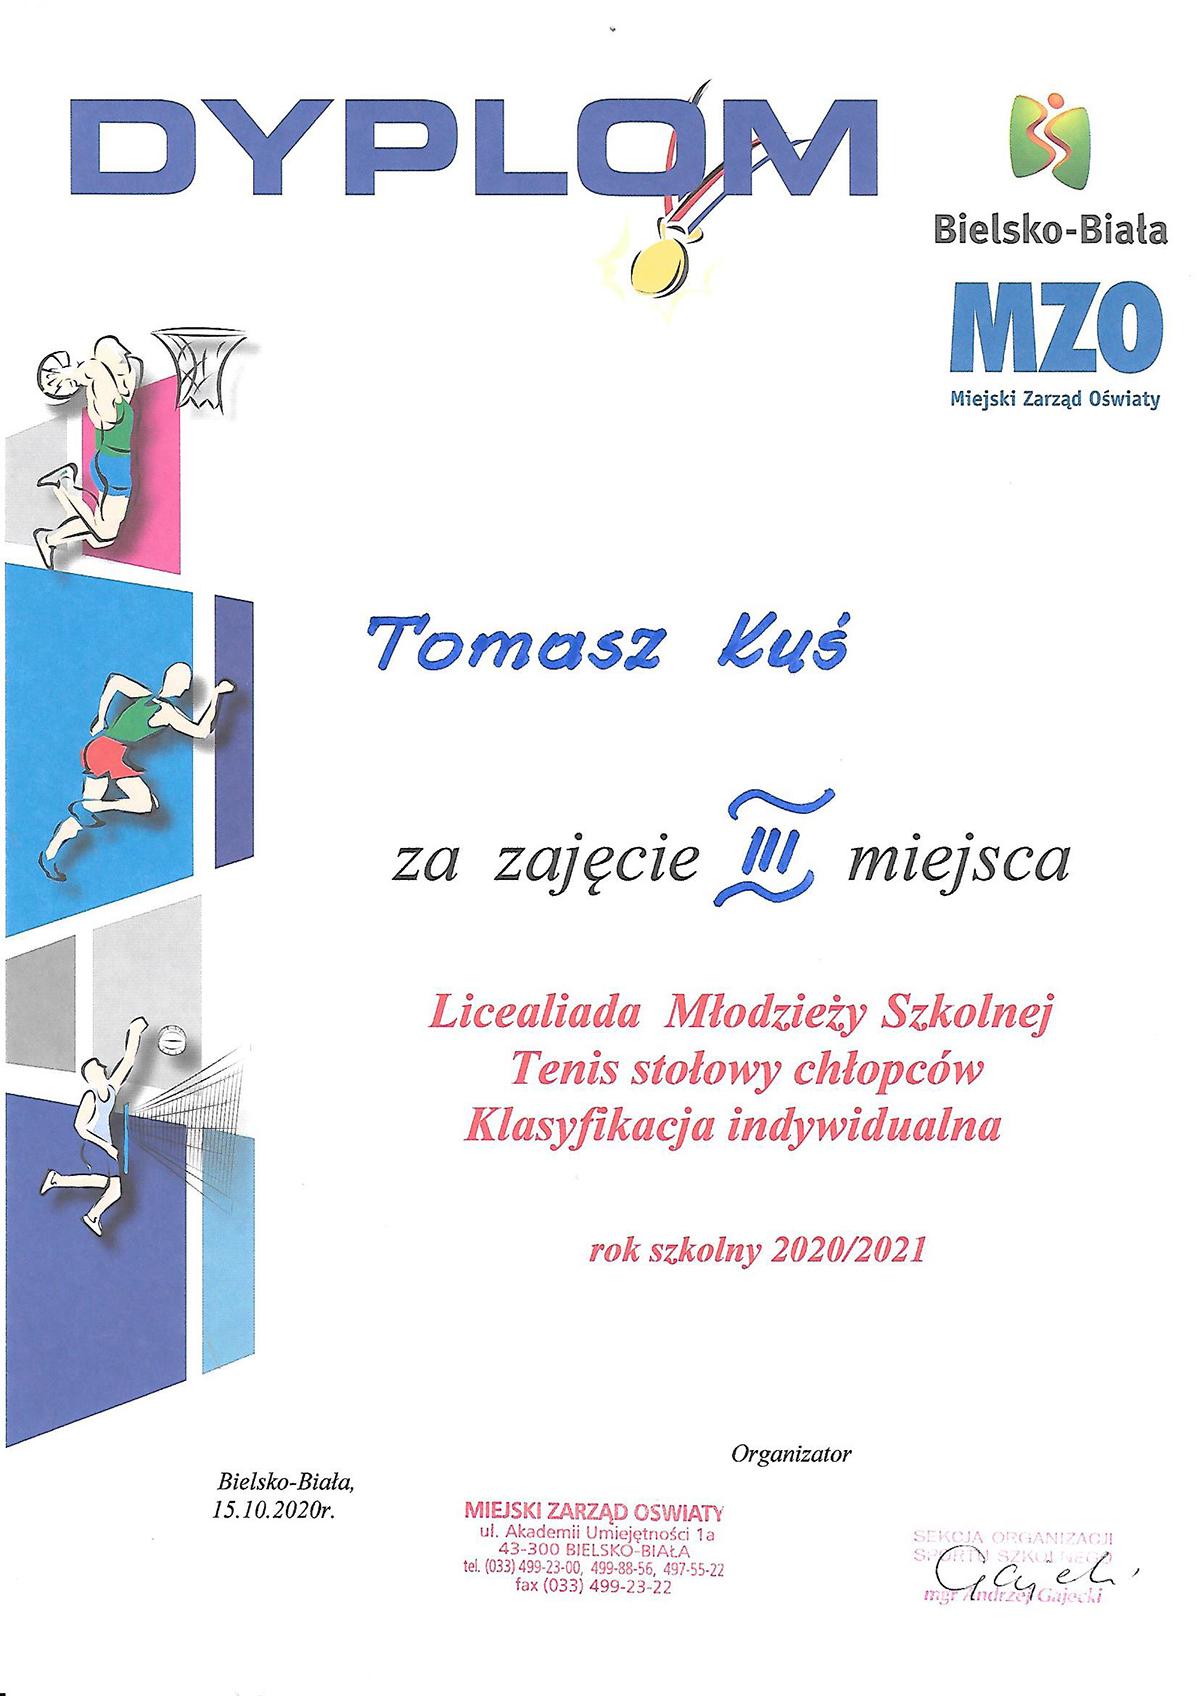 _Dyplom (2)